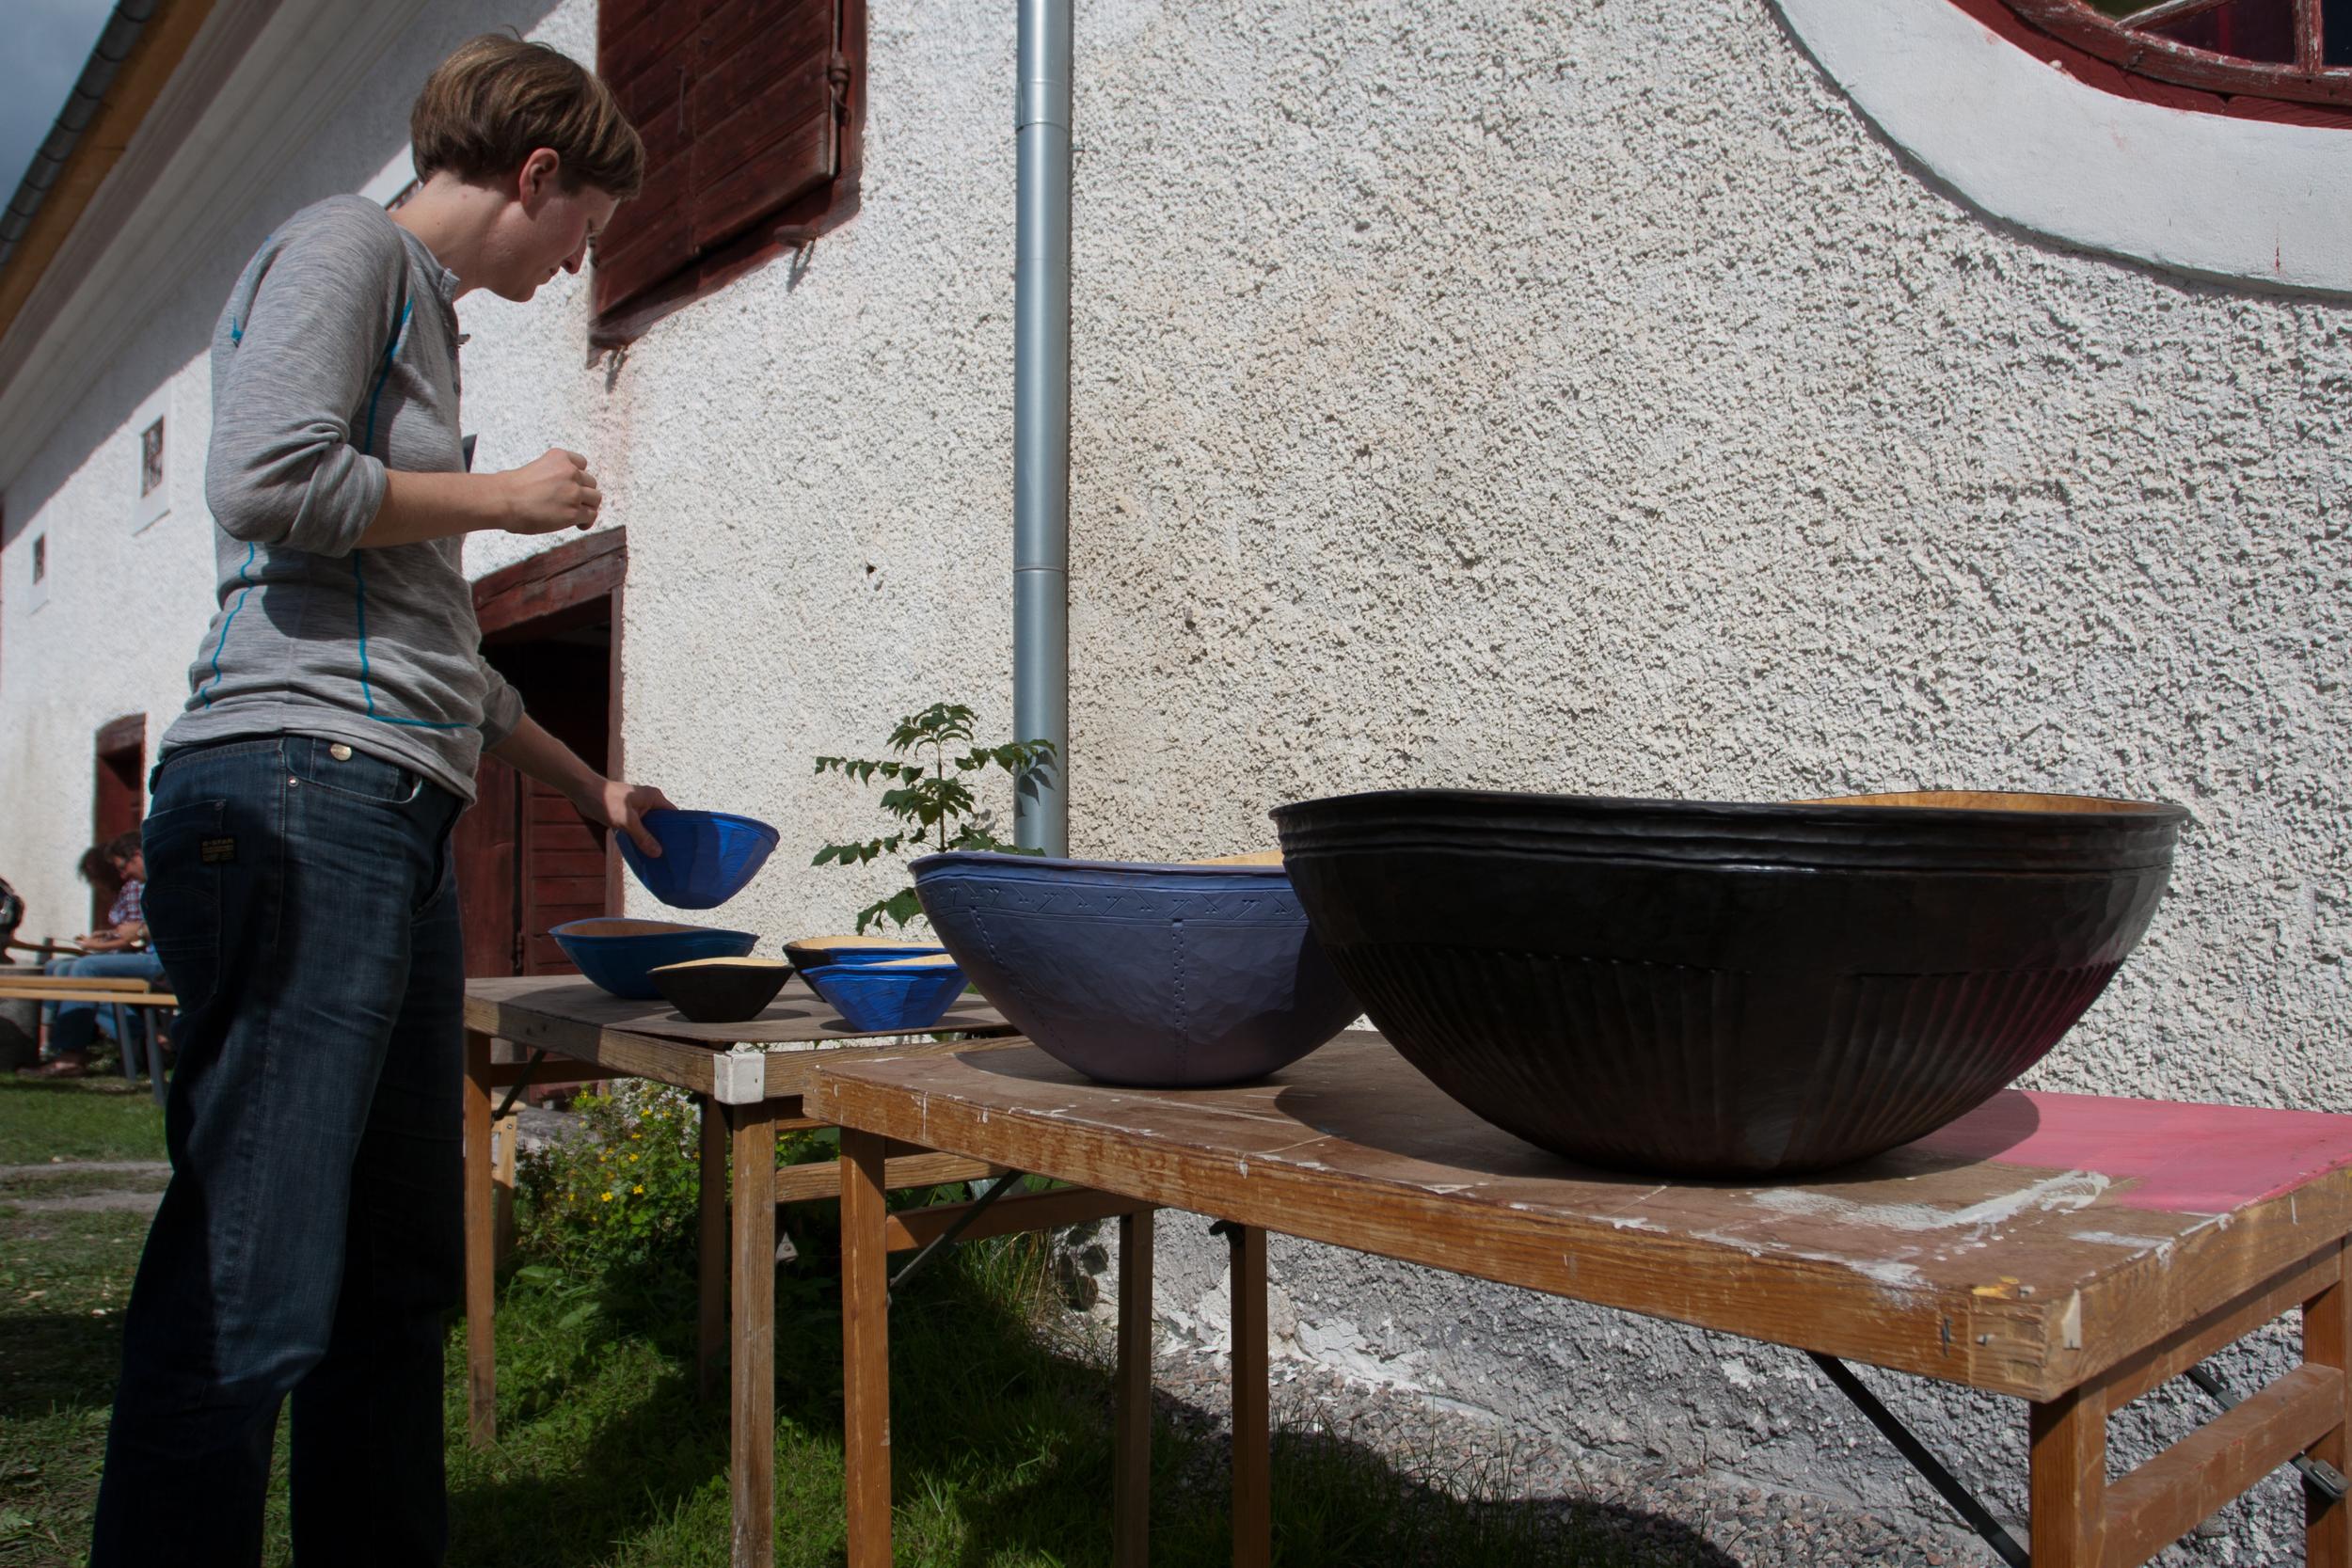 Beth Moen's bowls on display at Skedfest 2014